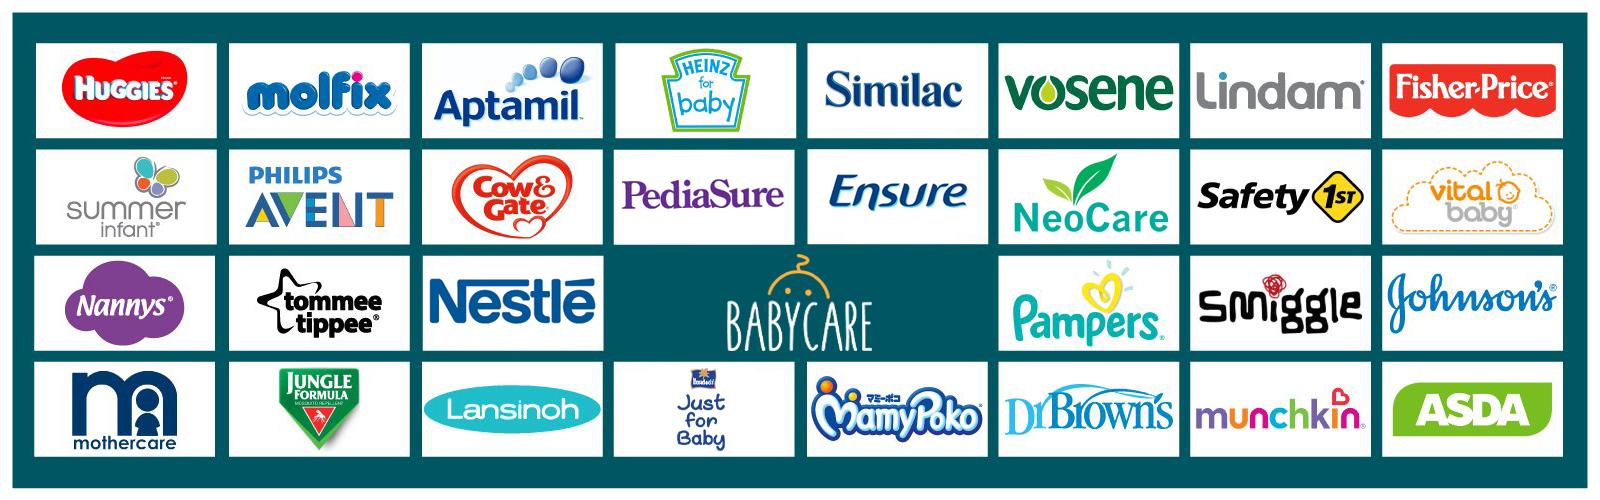 Babycare Banner